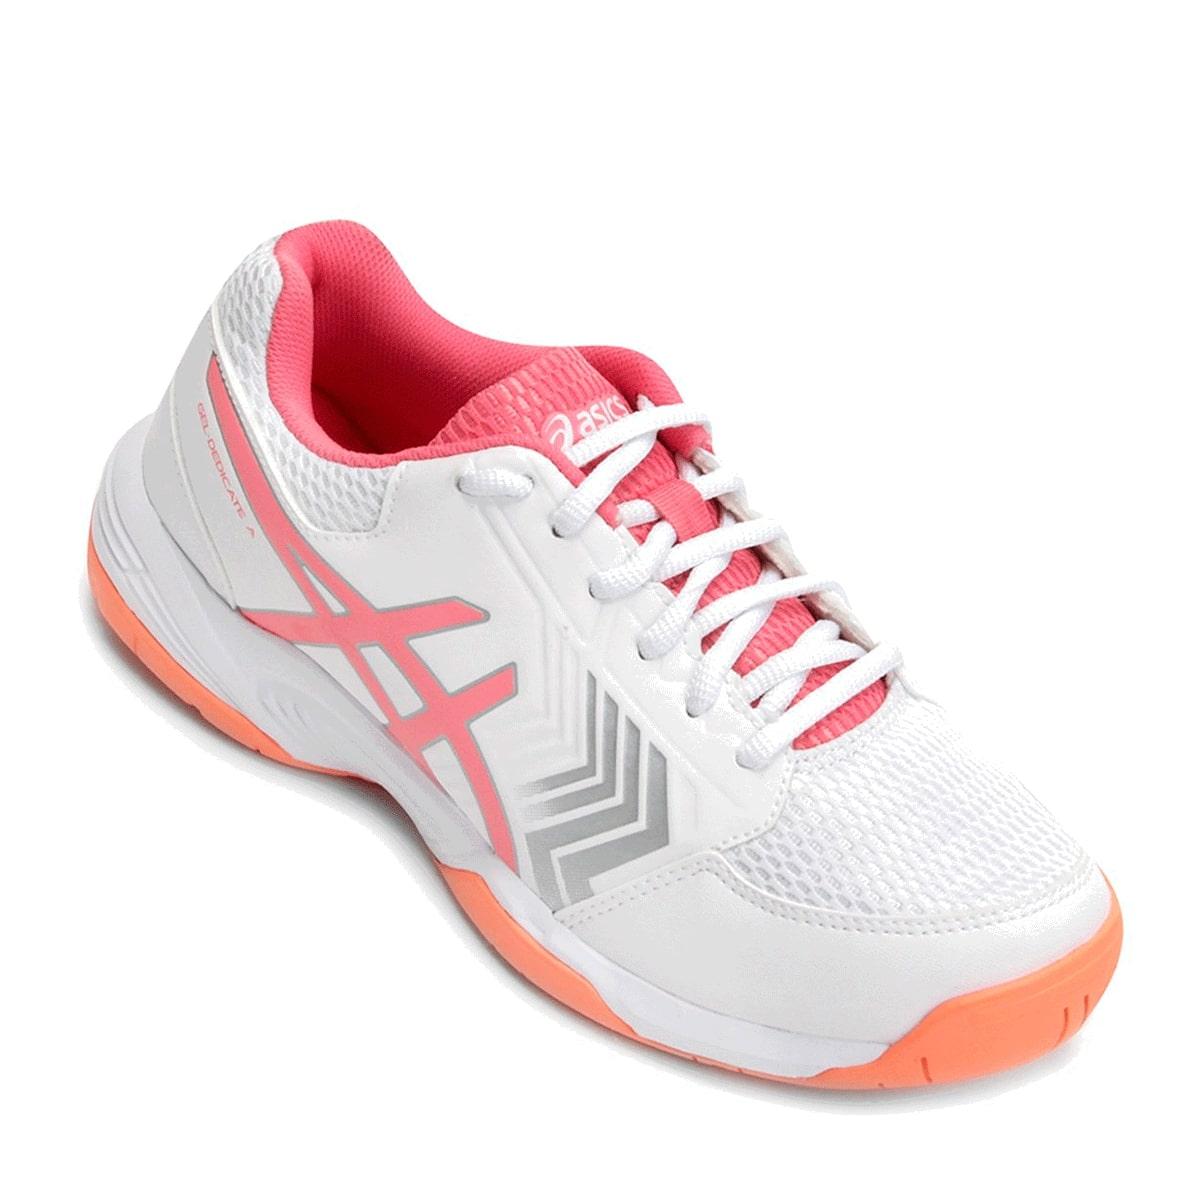 Tênis Asics Gel-Dedicate 5A Feminino Branco Rosa